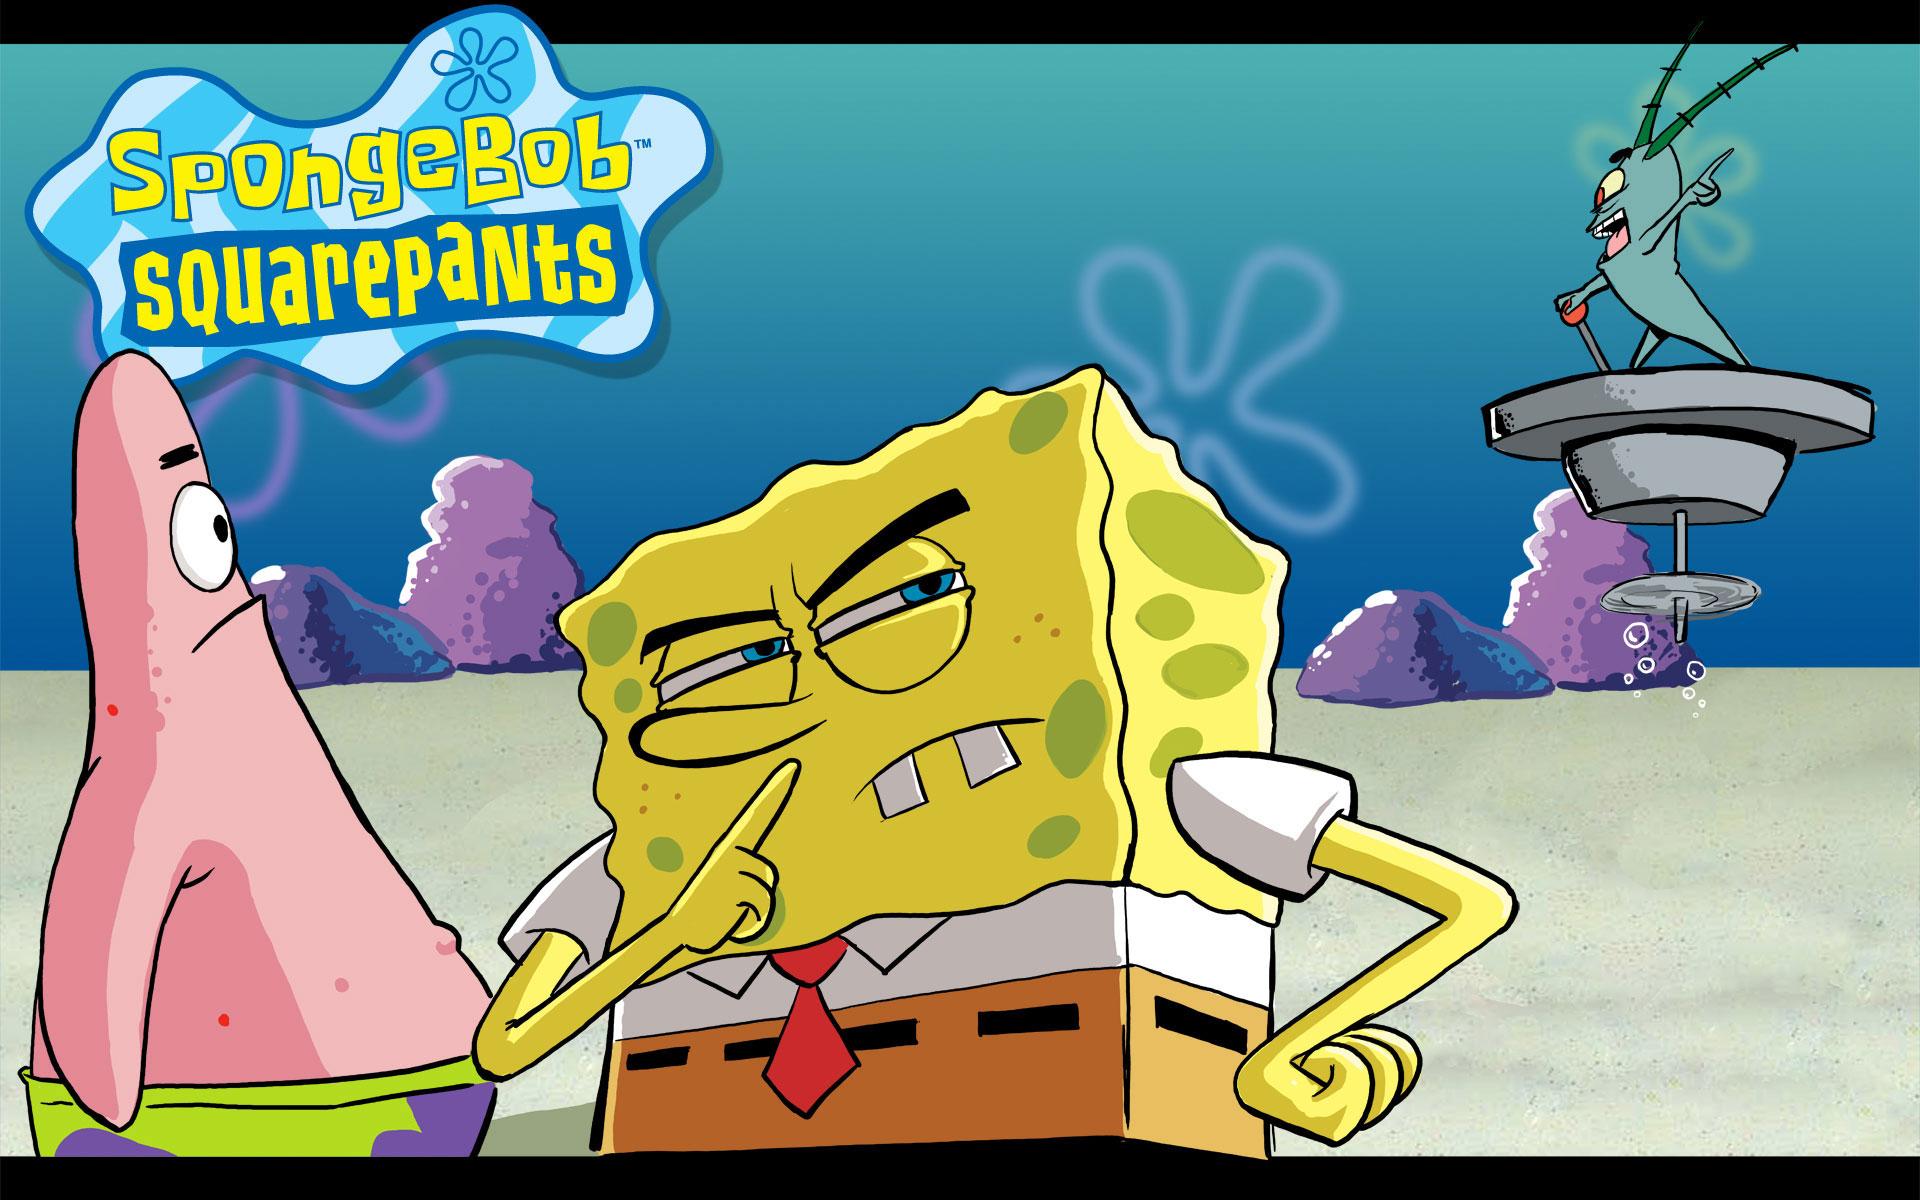 Spongebob Squarepants Cartoons Wallpapers 1920x1200